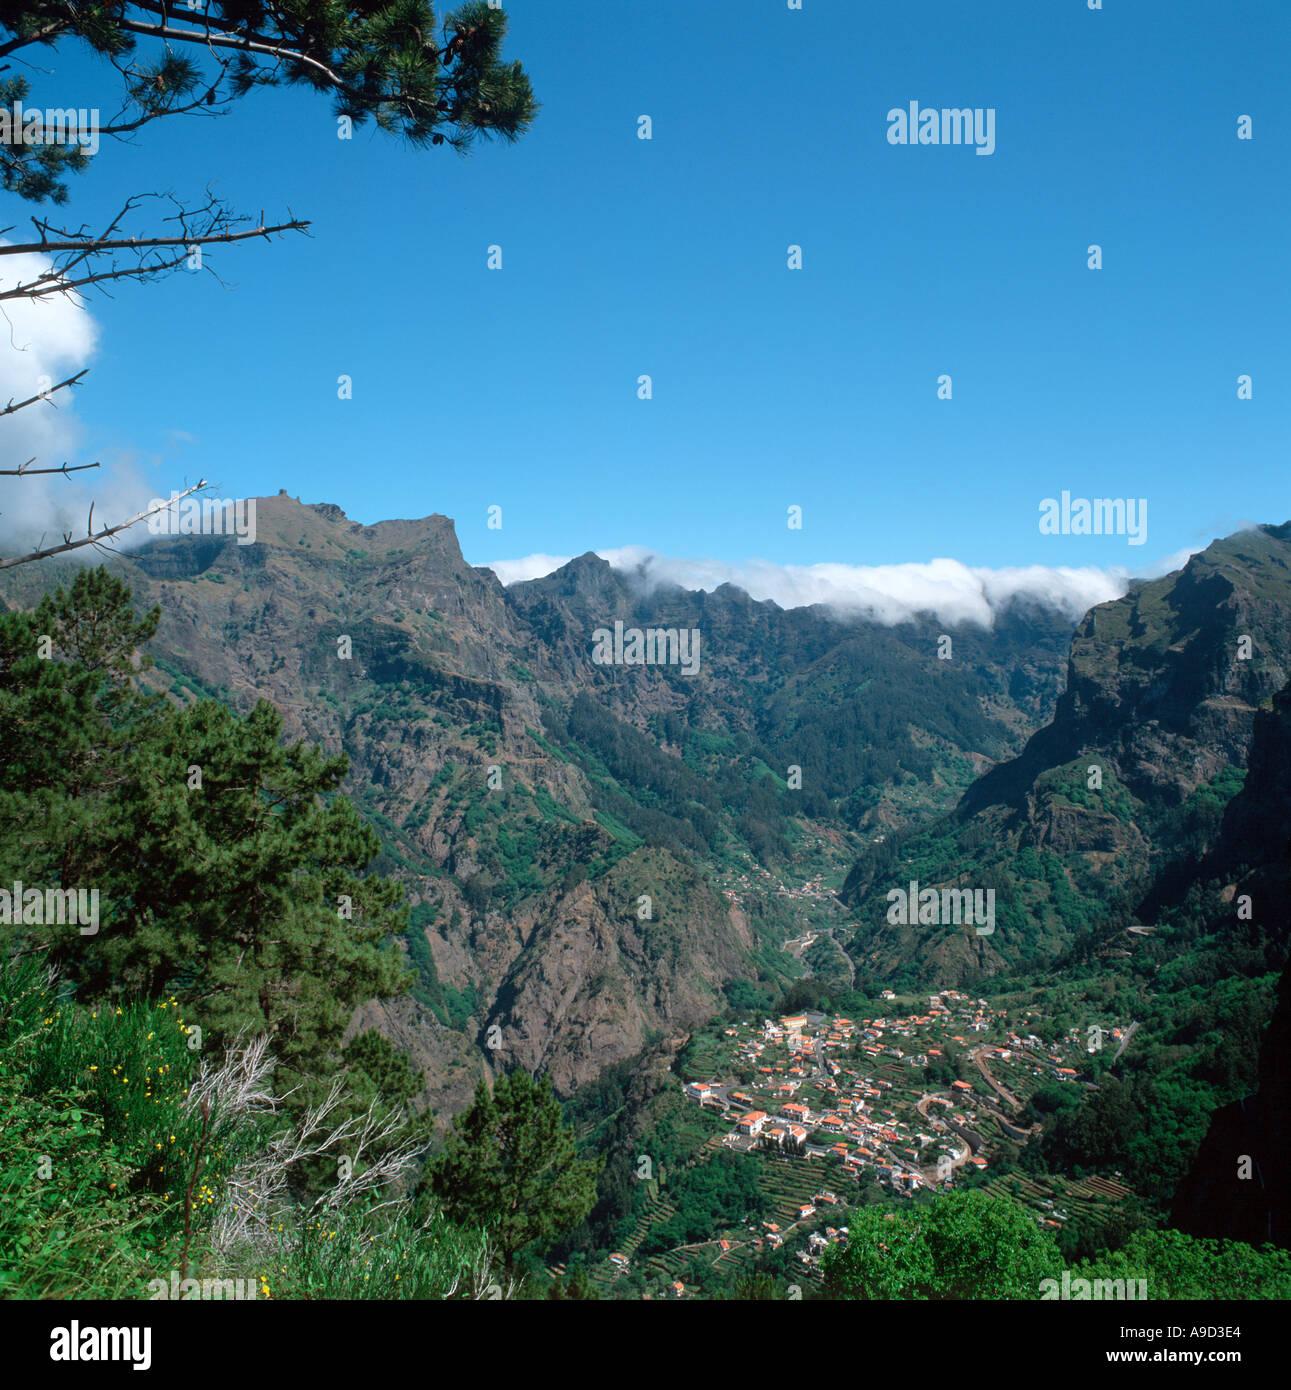 The mountain village of Curral das Freiras (Valley of the Nuns), Madeira, Portugal - Stock Image